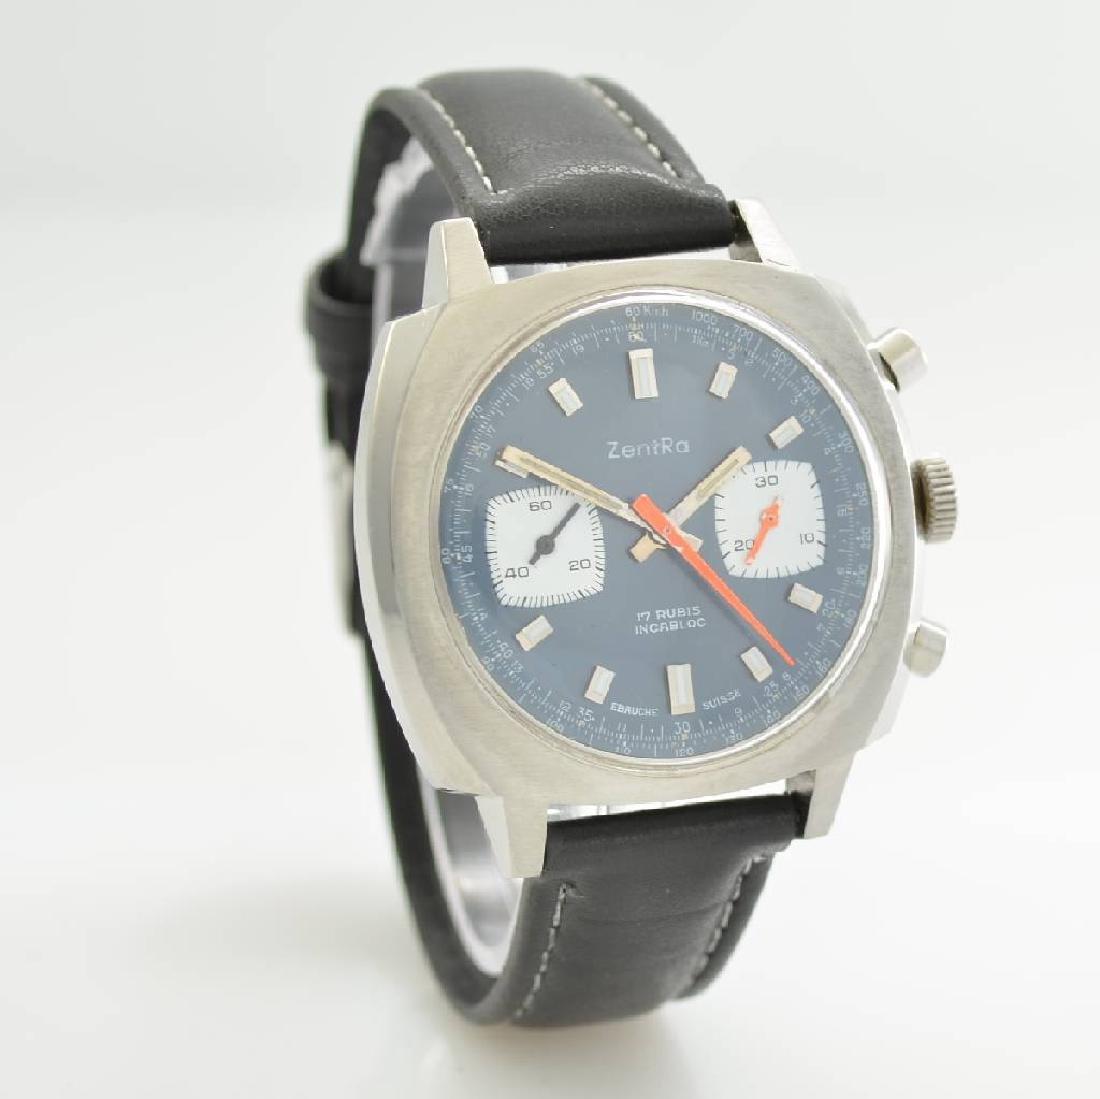 ZENTRA chronograph, Switzerland around 1970 - 5